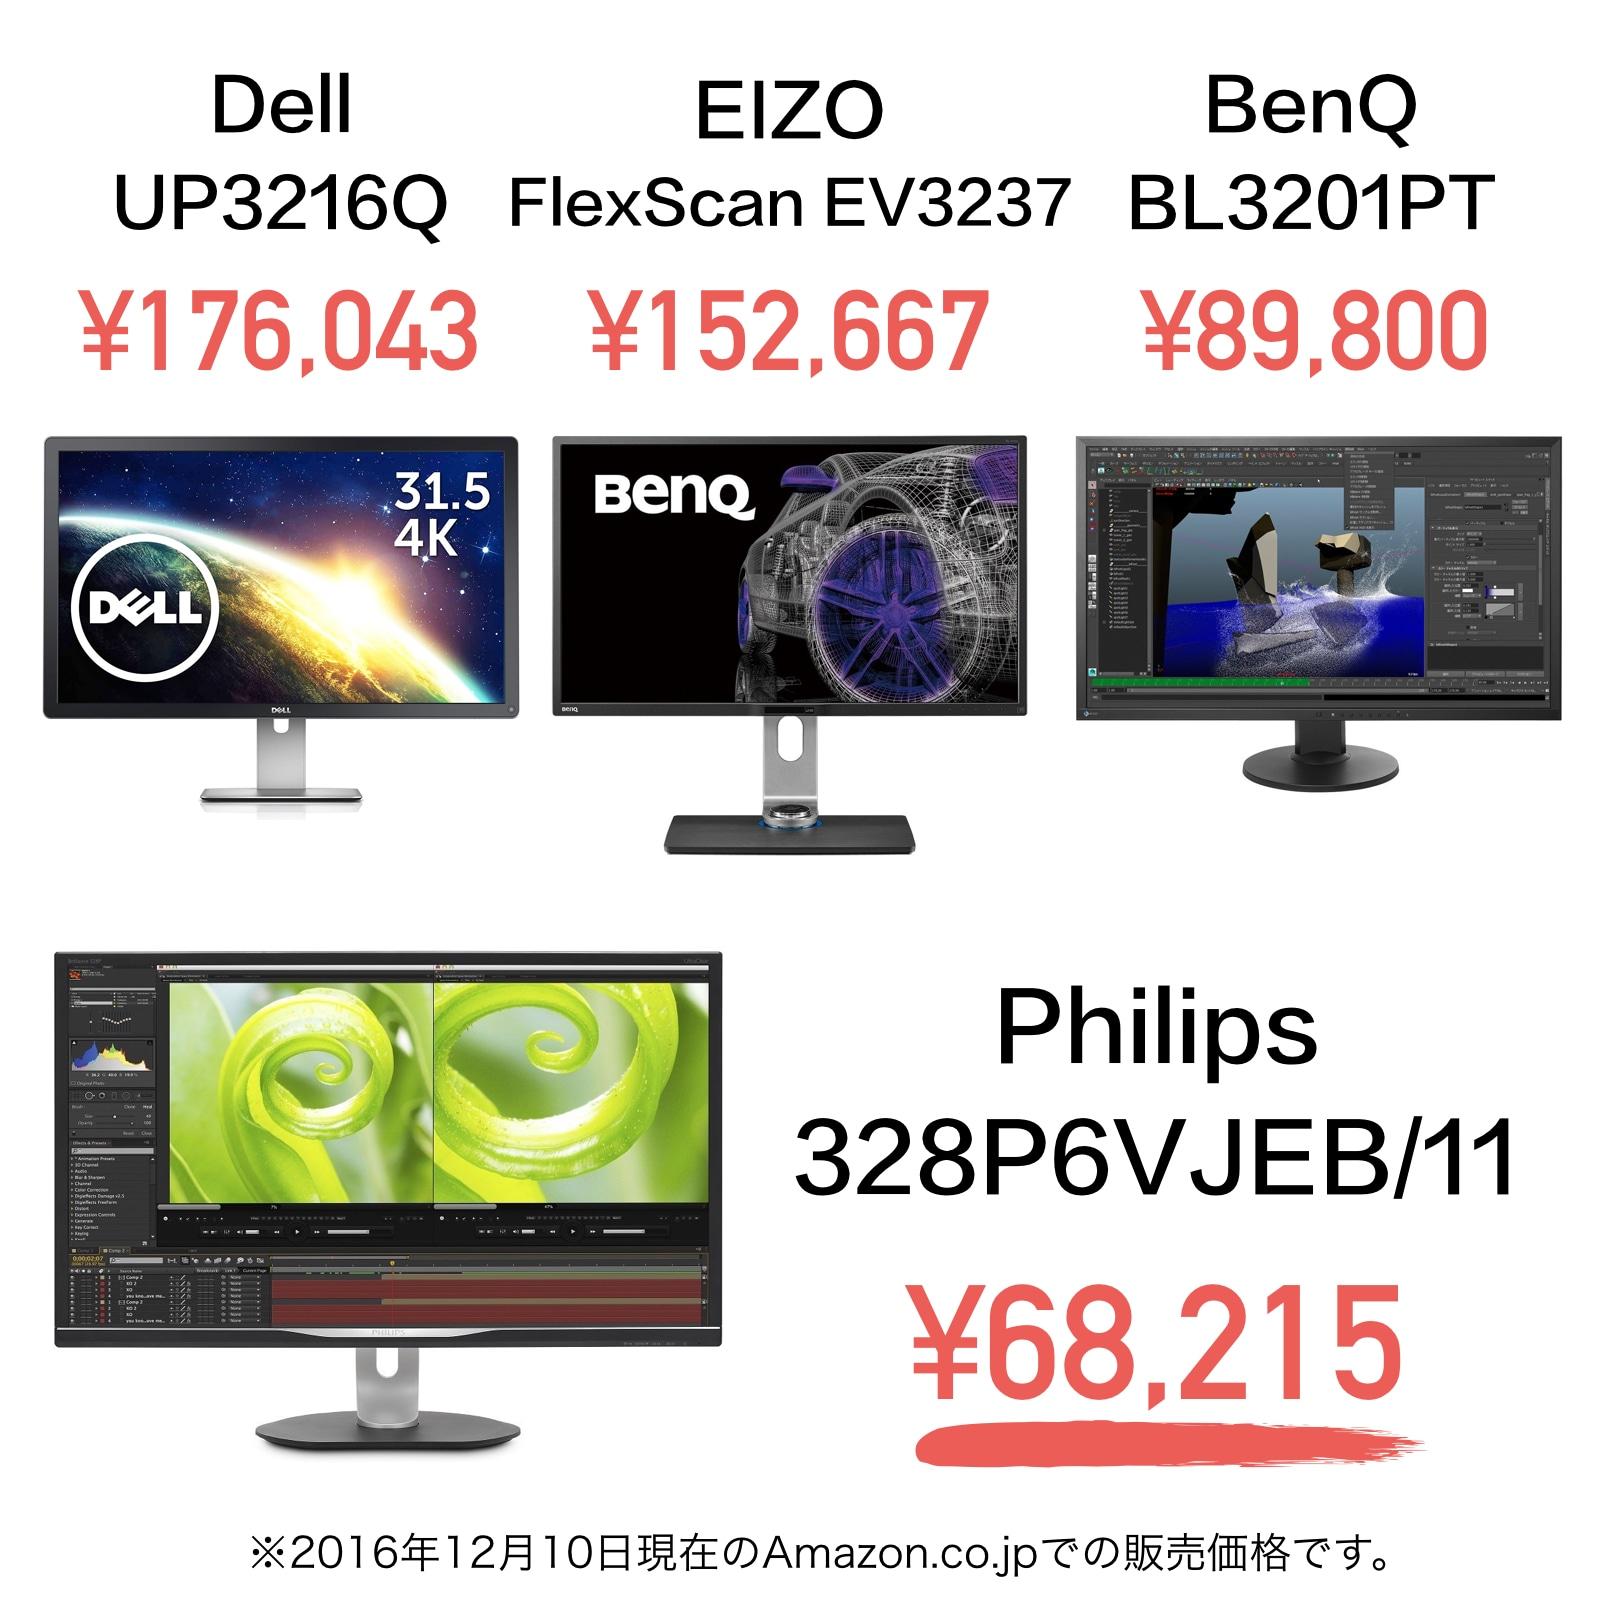 Philips 328P6VJEB/11の価格と他社製品との比較